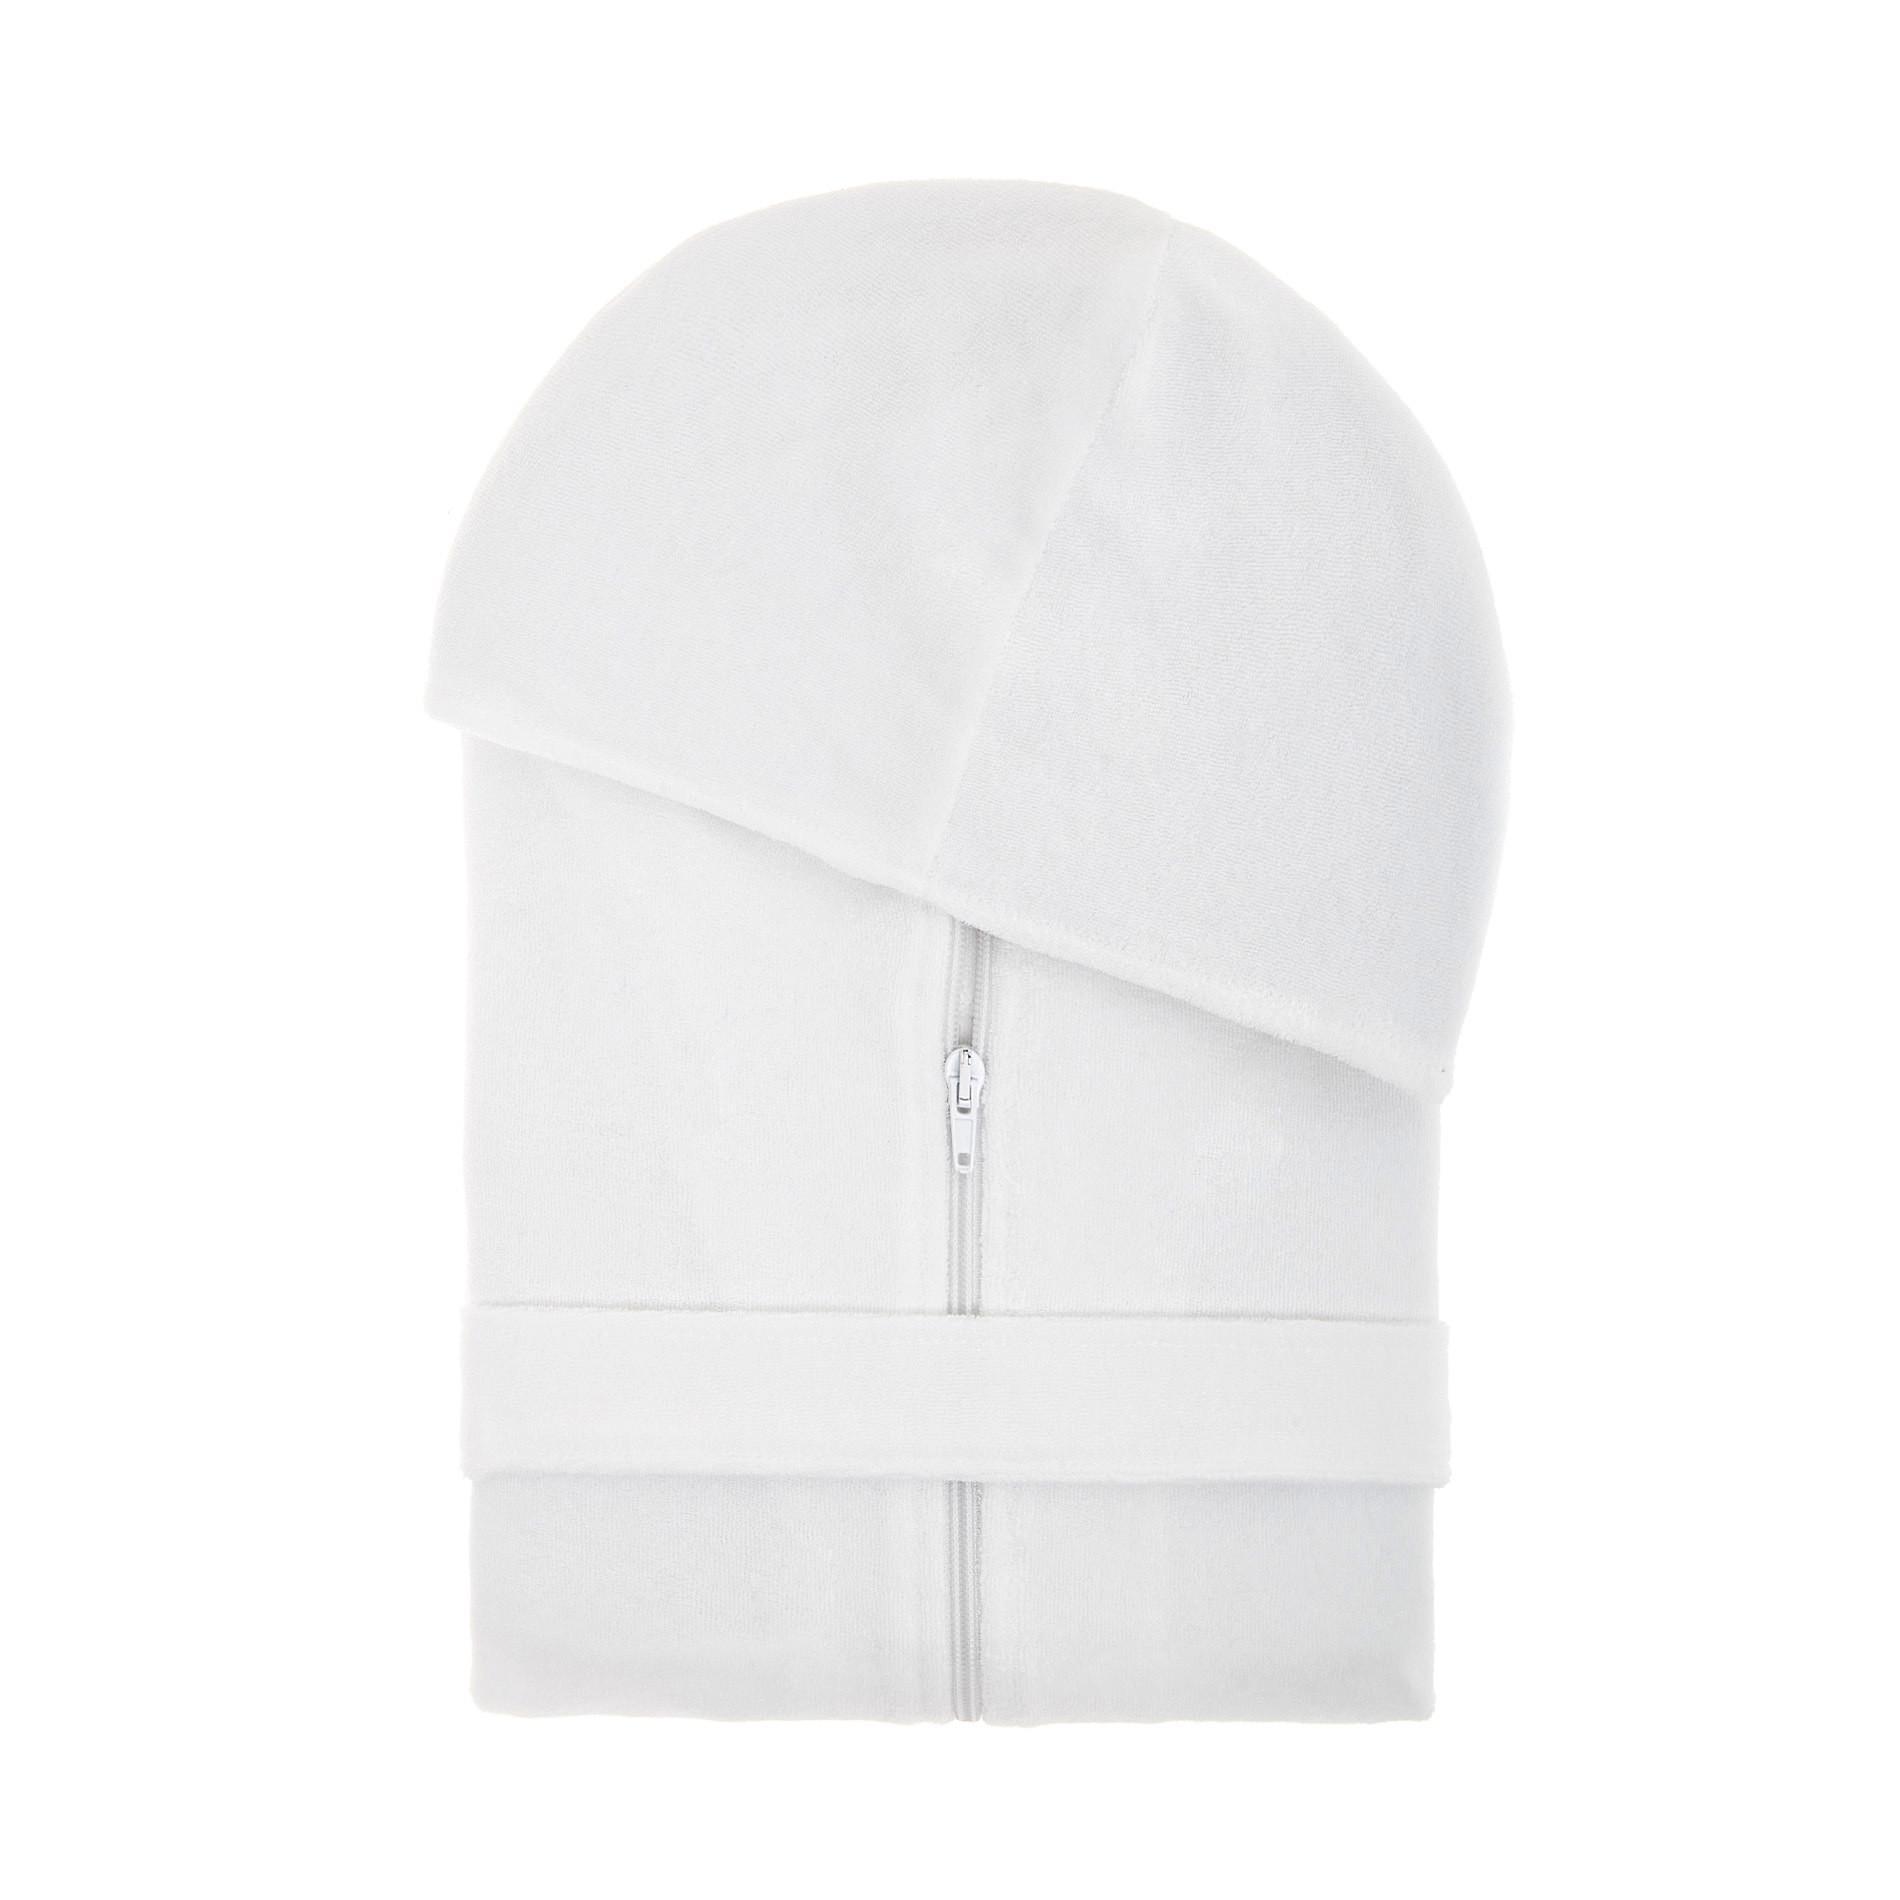 Accappatoio cotone con zip tinta unita, Bianco, large image number 0